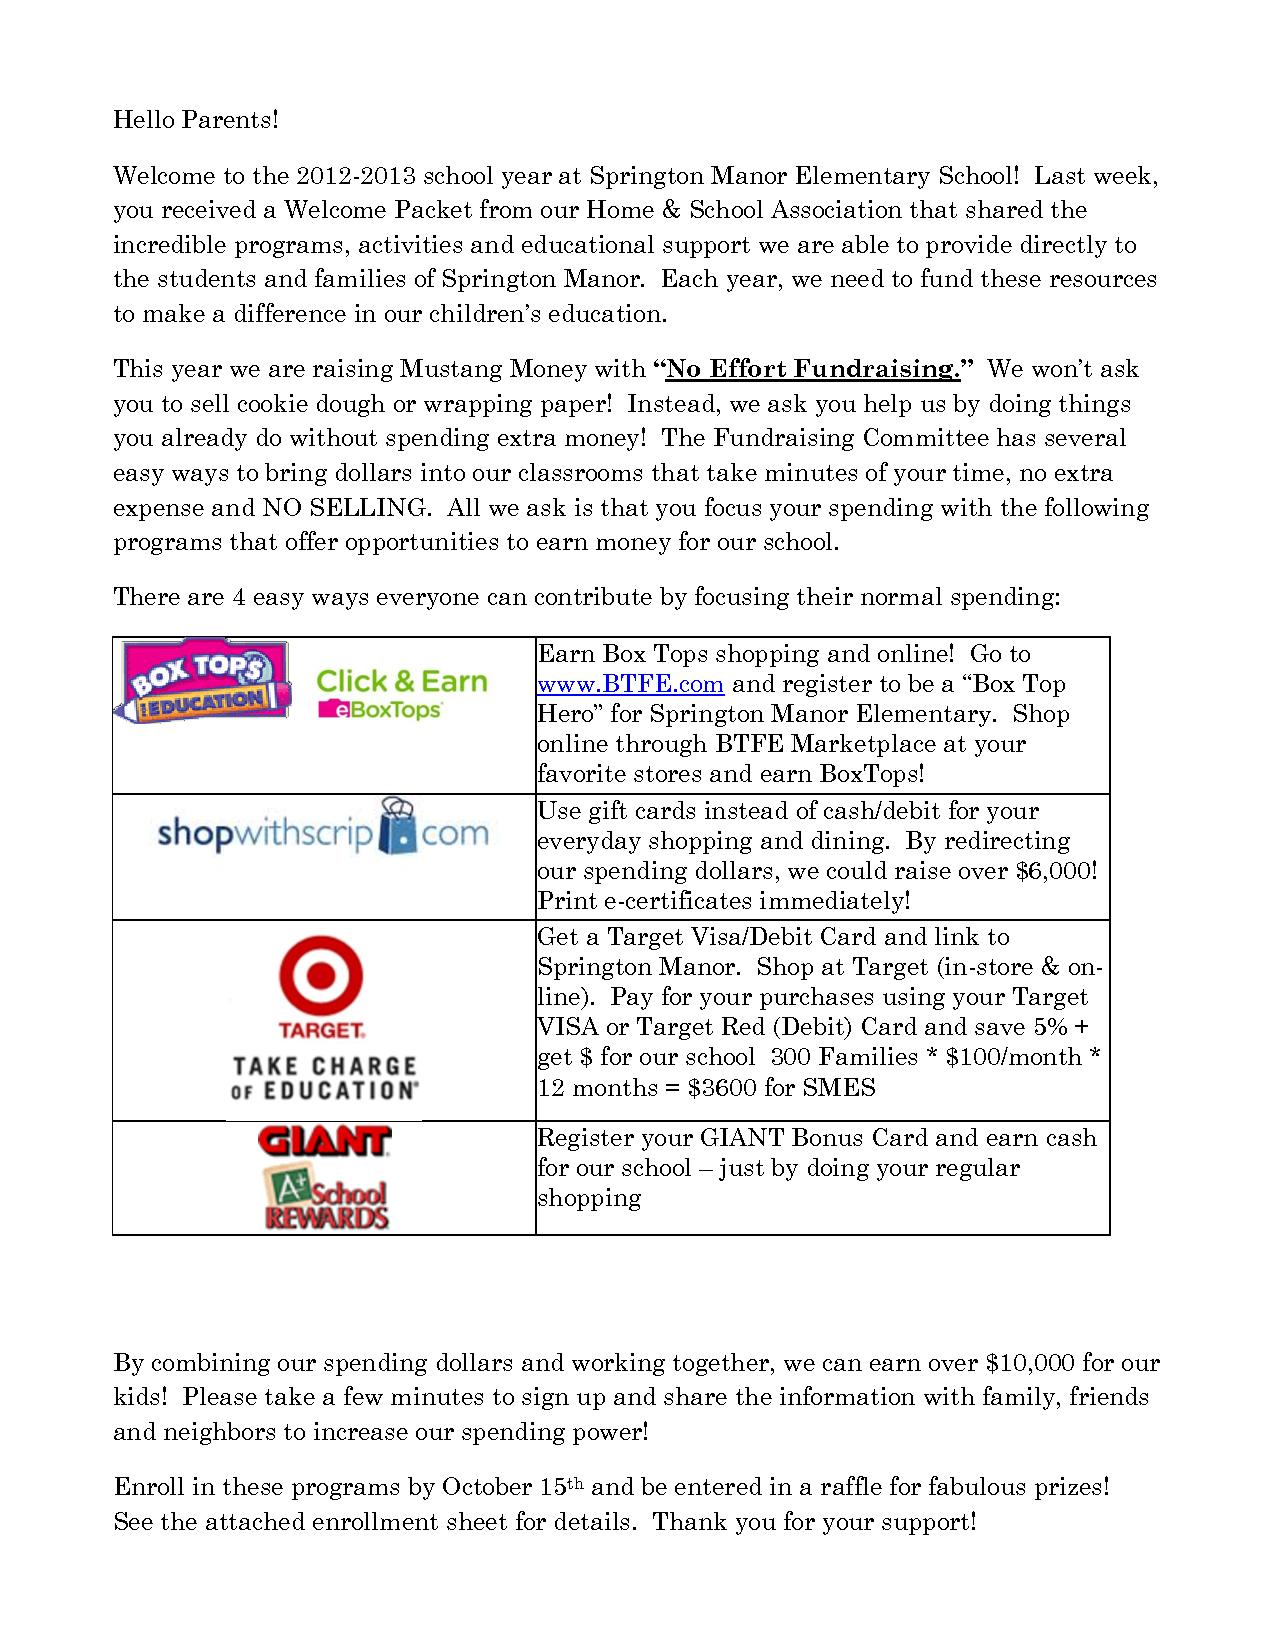 No Effort Fundraising Kickoff Letter by pengxuebo | PTO